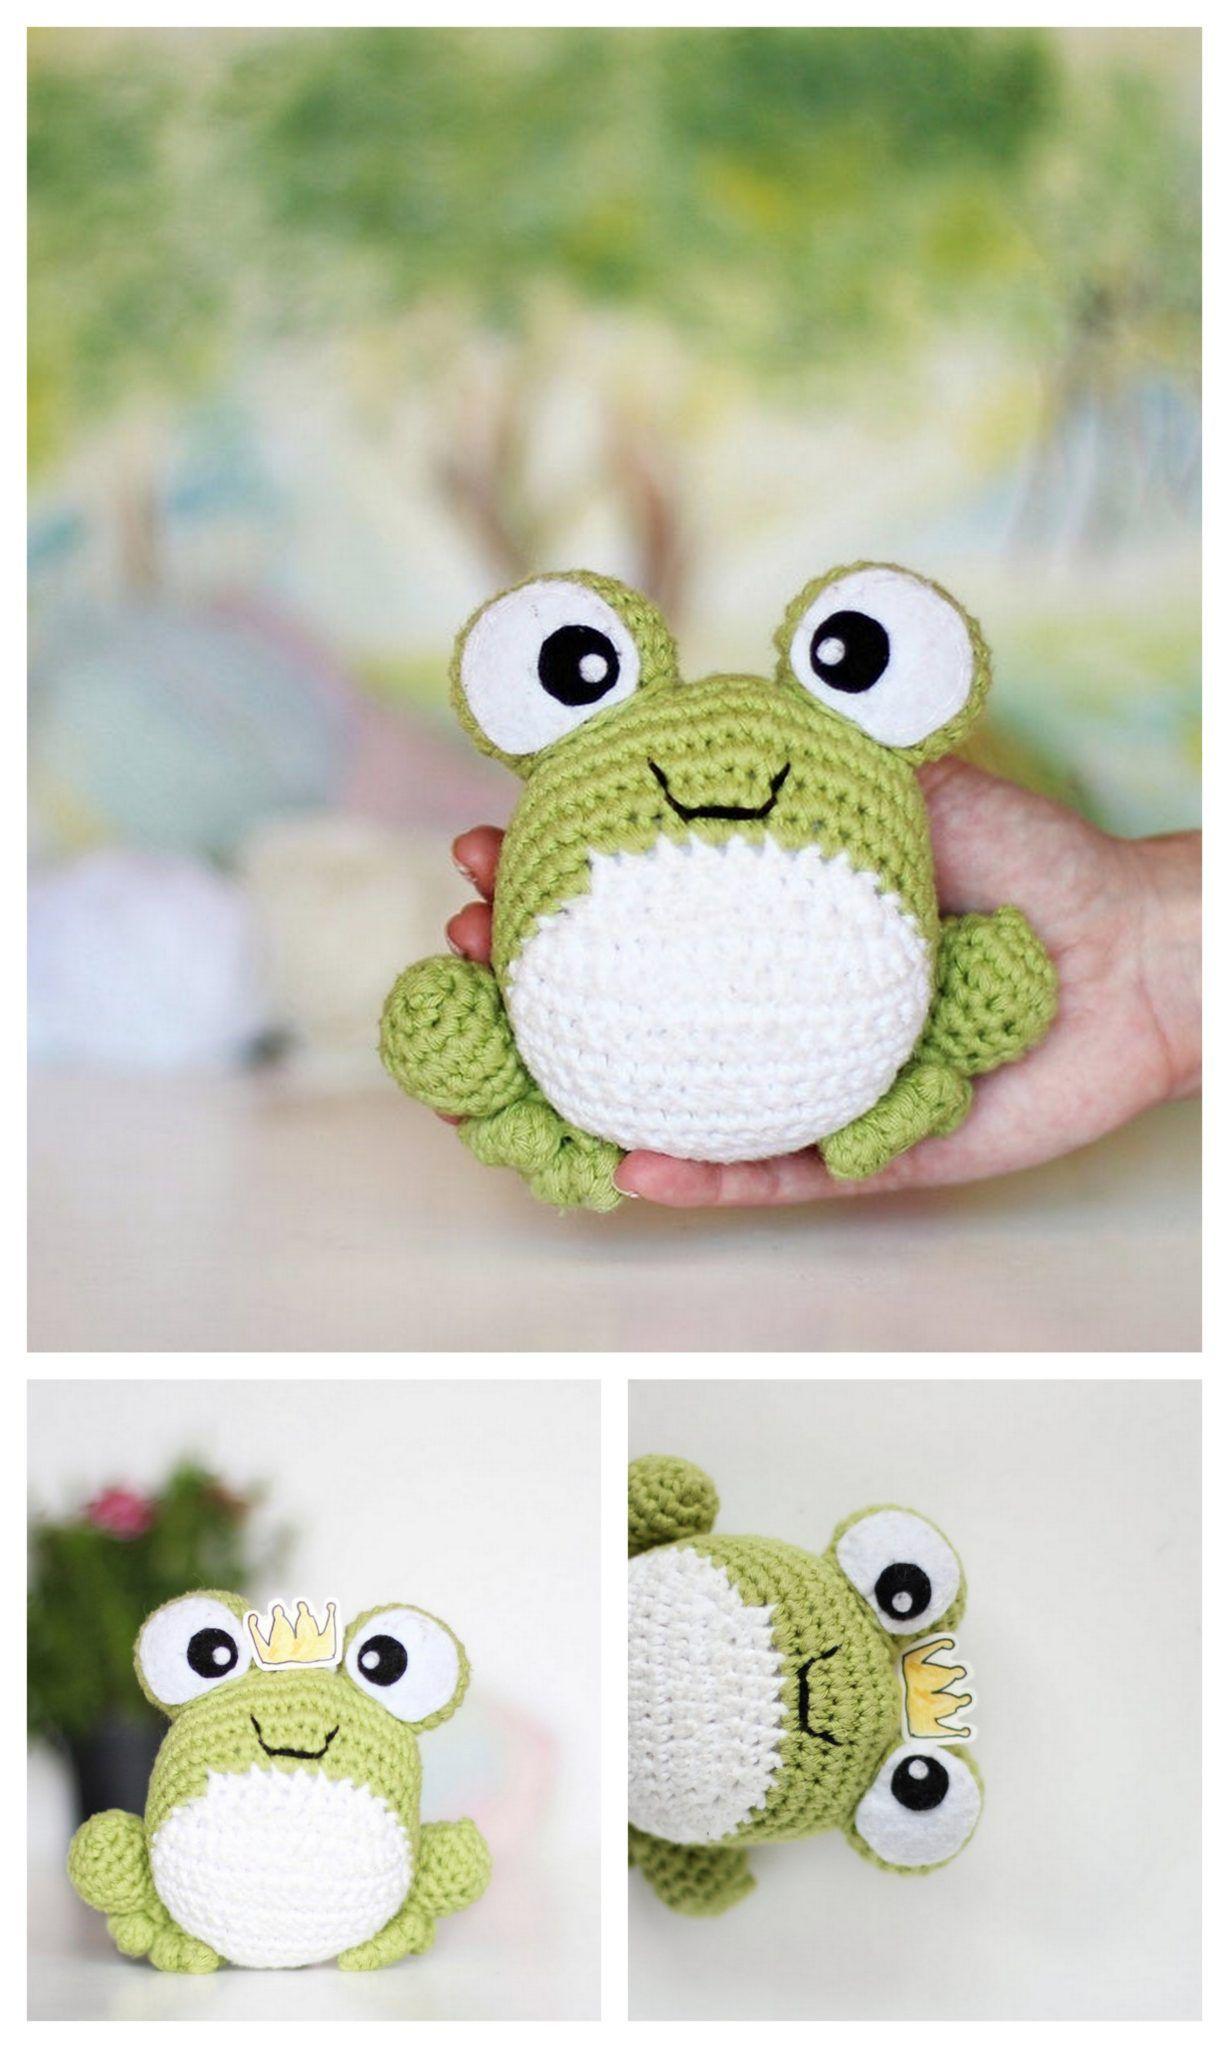 crochet frog step by step frog pdf crochet pattern frog amigurumi pattern Harry the frog prince crochet pattern frog crochet tutorial